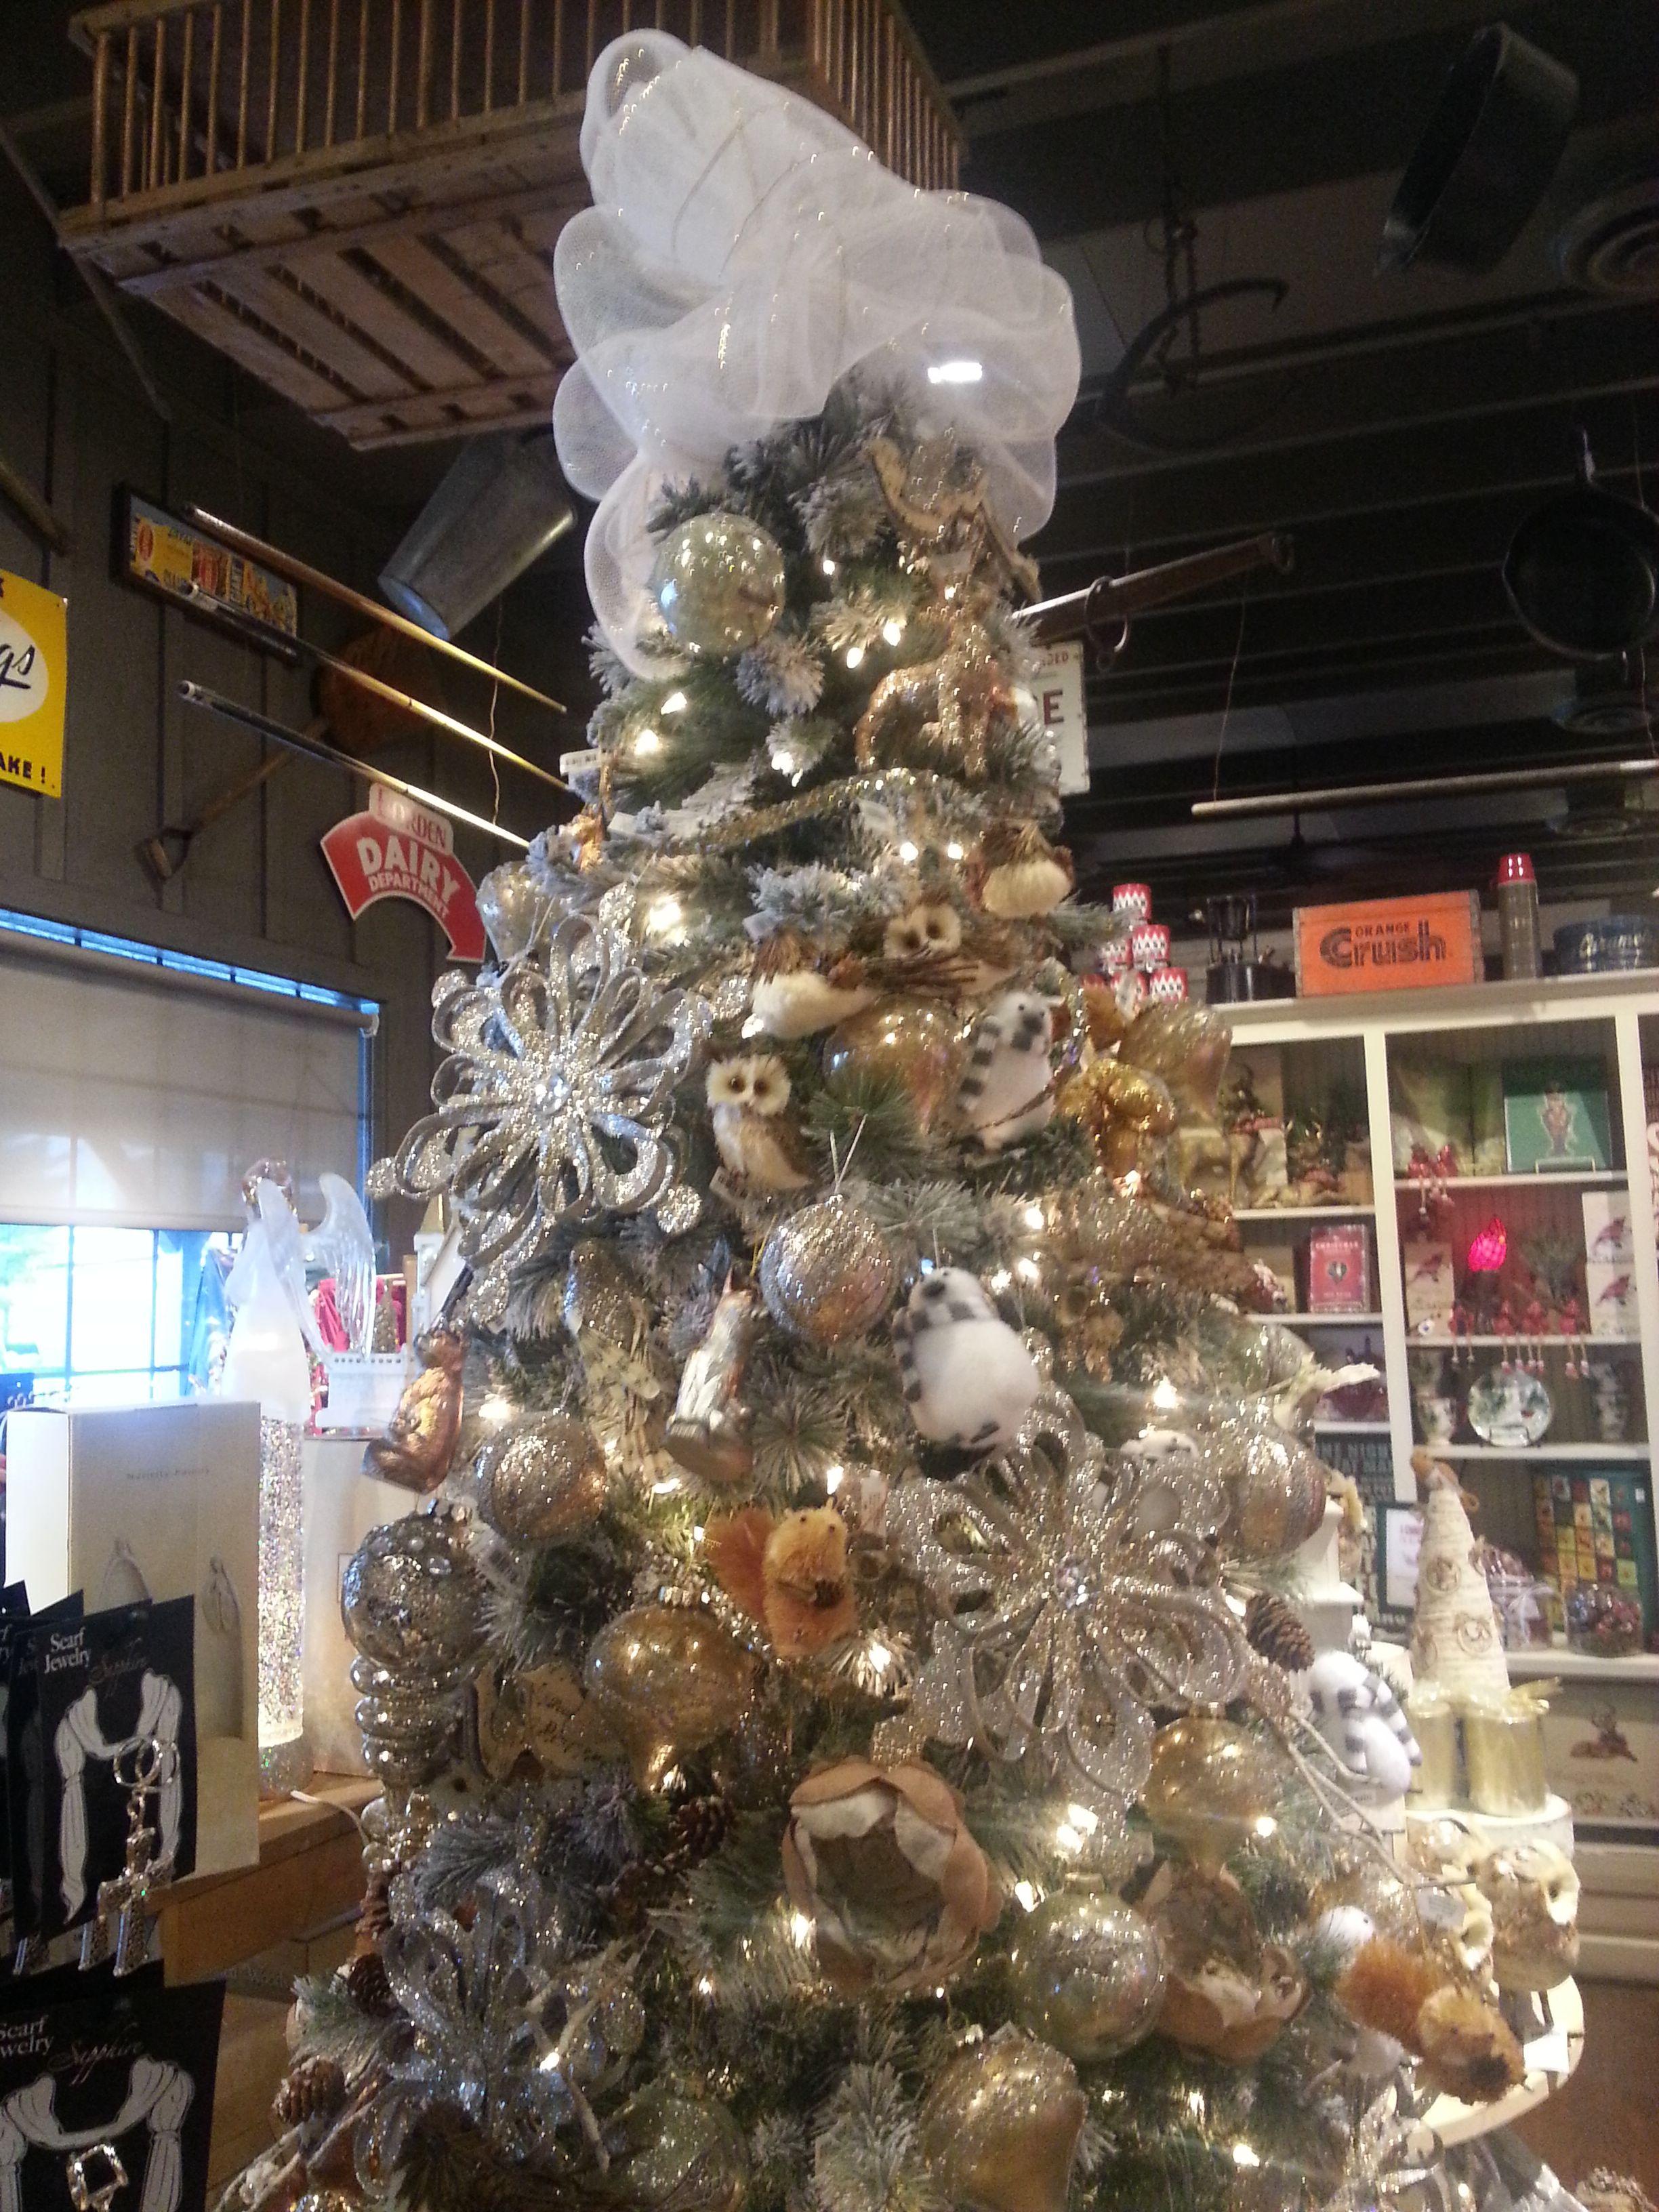 Christmas Tree In Cracker Barrel My Favorite Christmas Theme This Year Christmas Tree Country Christmas Christmas Themes